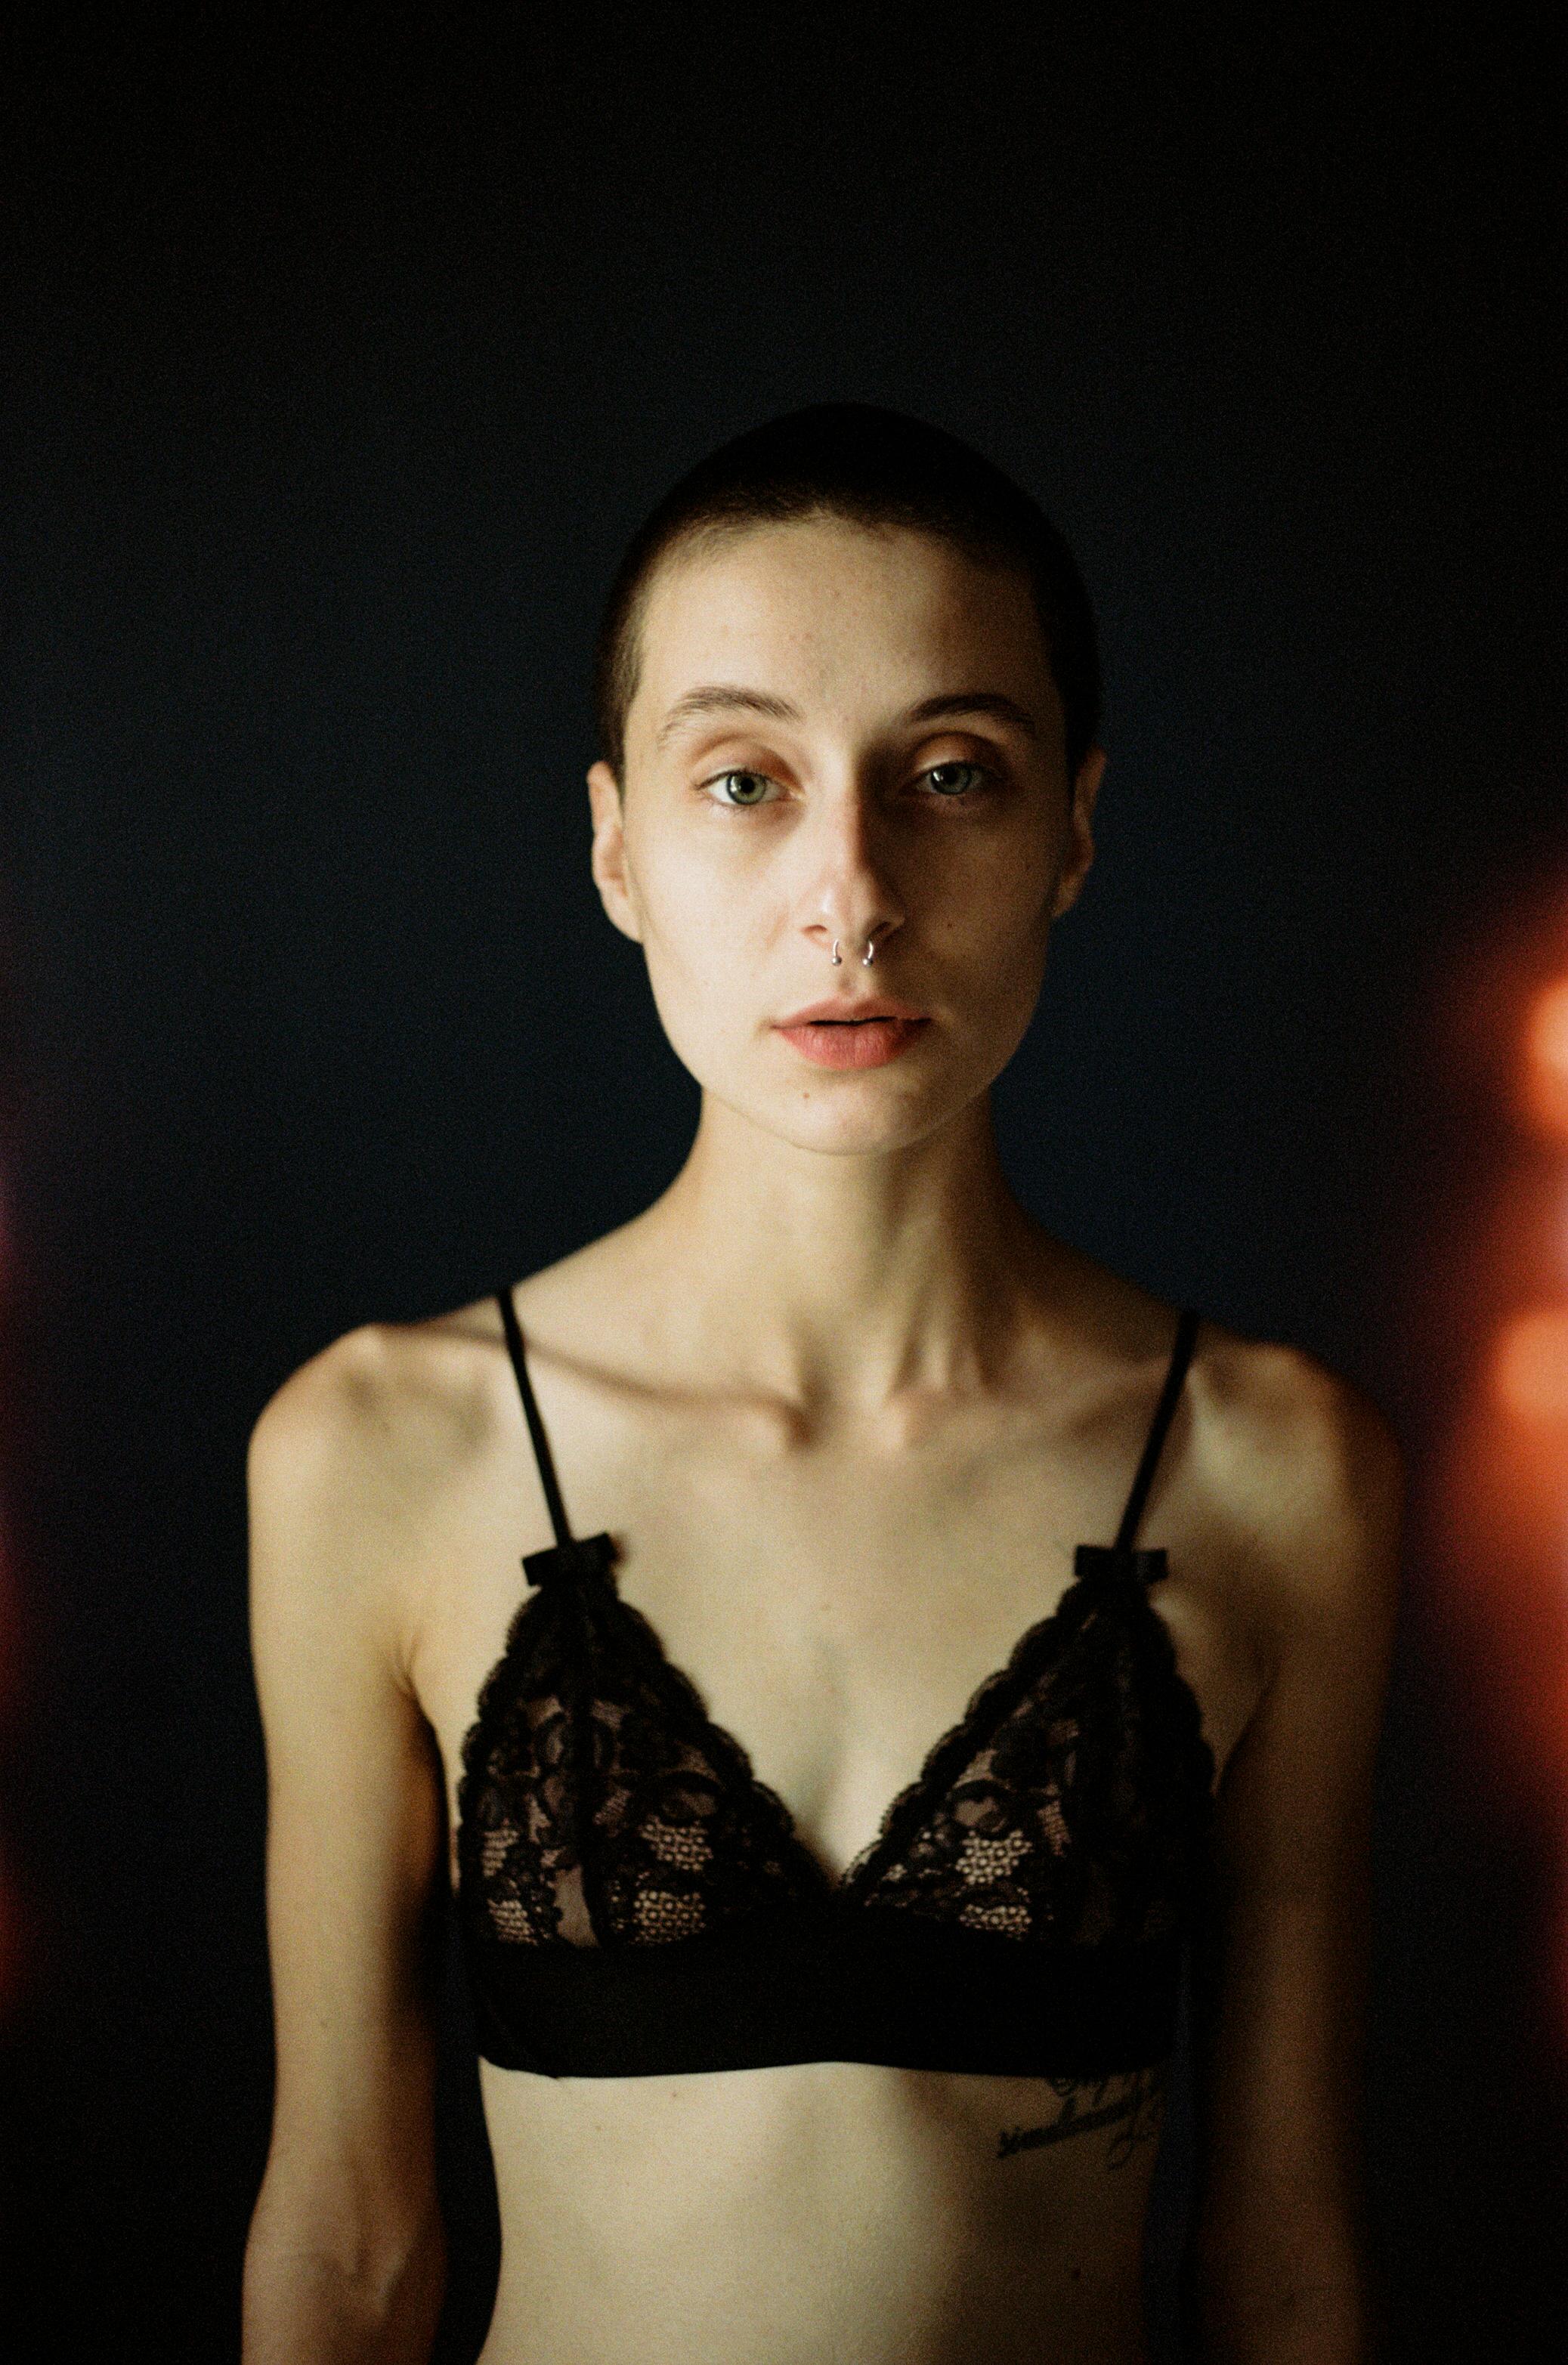 35mm film portrait. light leak. canon ae-1. moody portrait. emotional portrait. ohio portrait photographer. sarah rose photography. i am sarah rose.